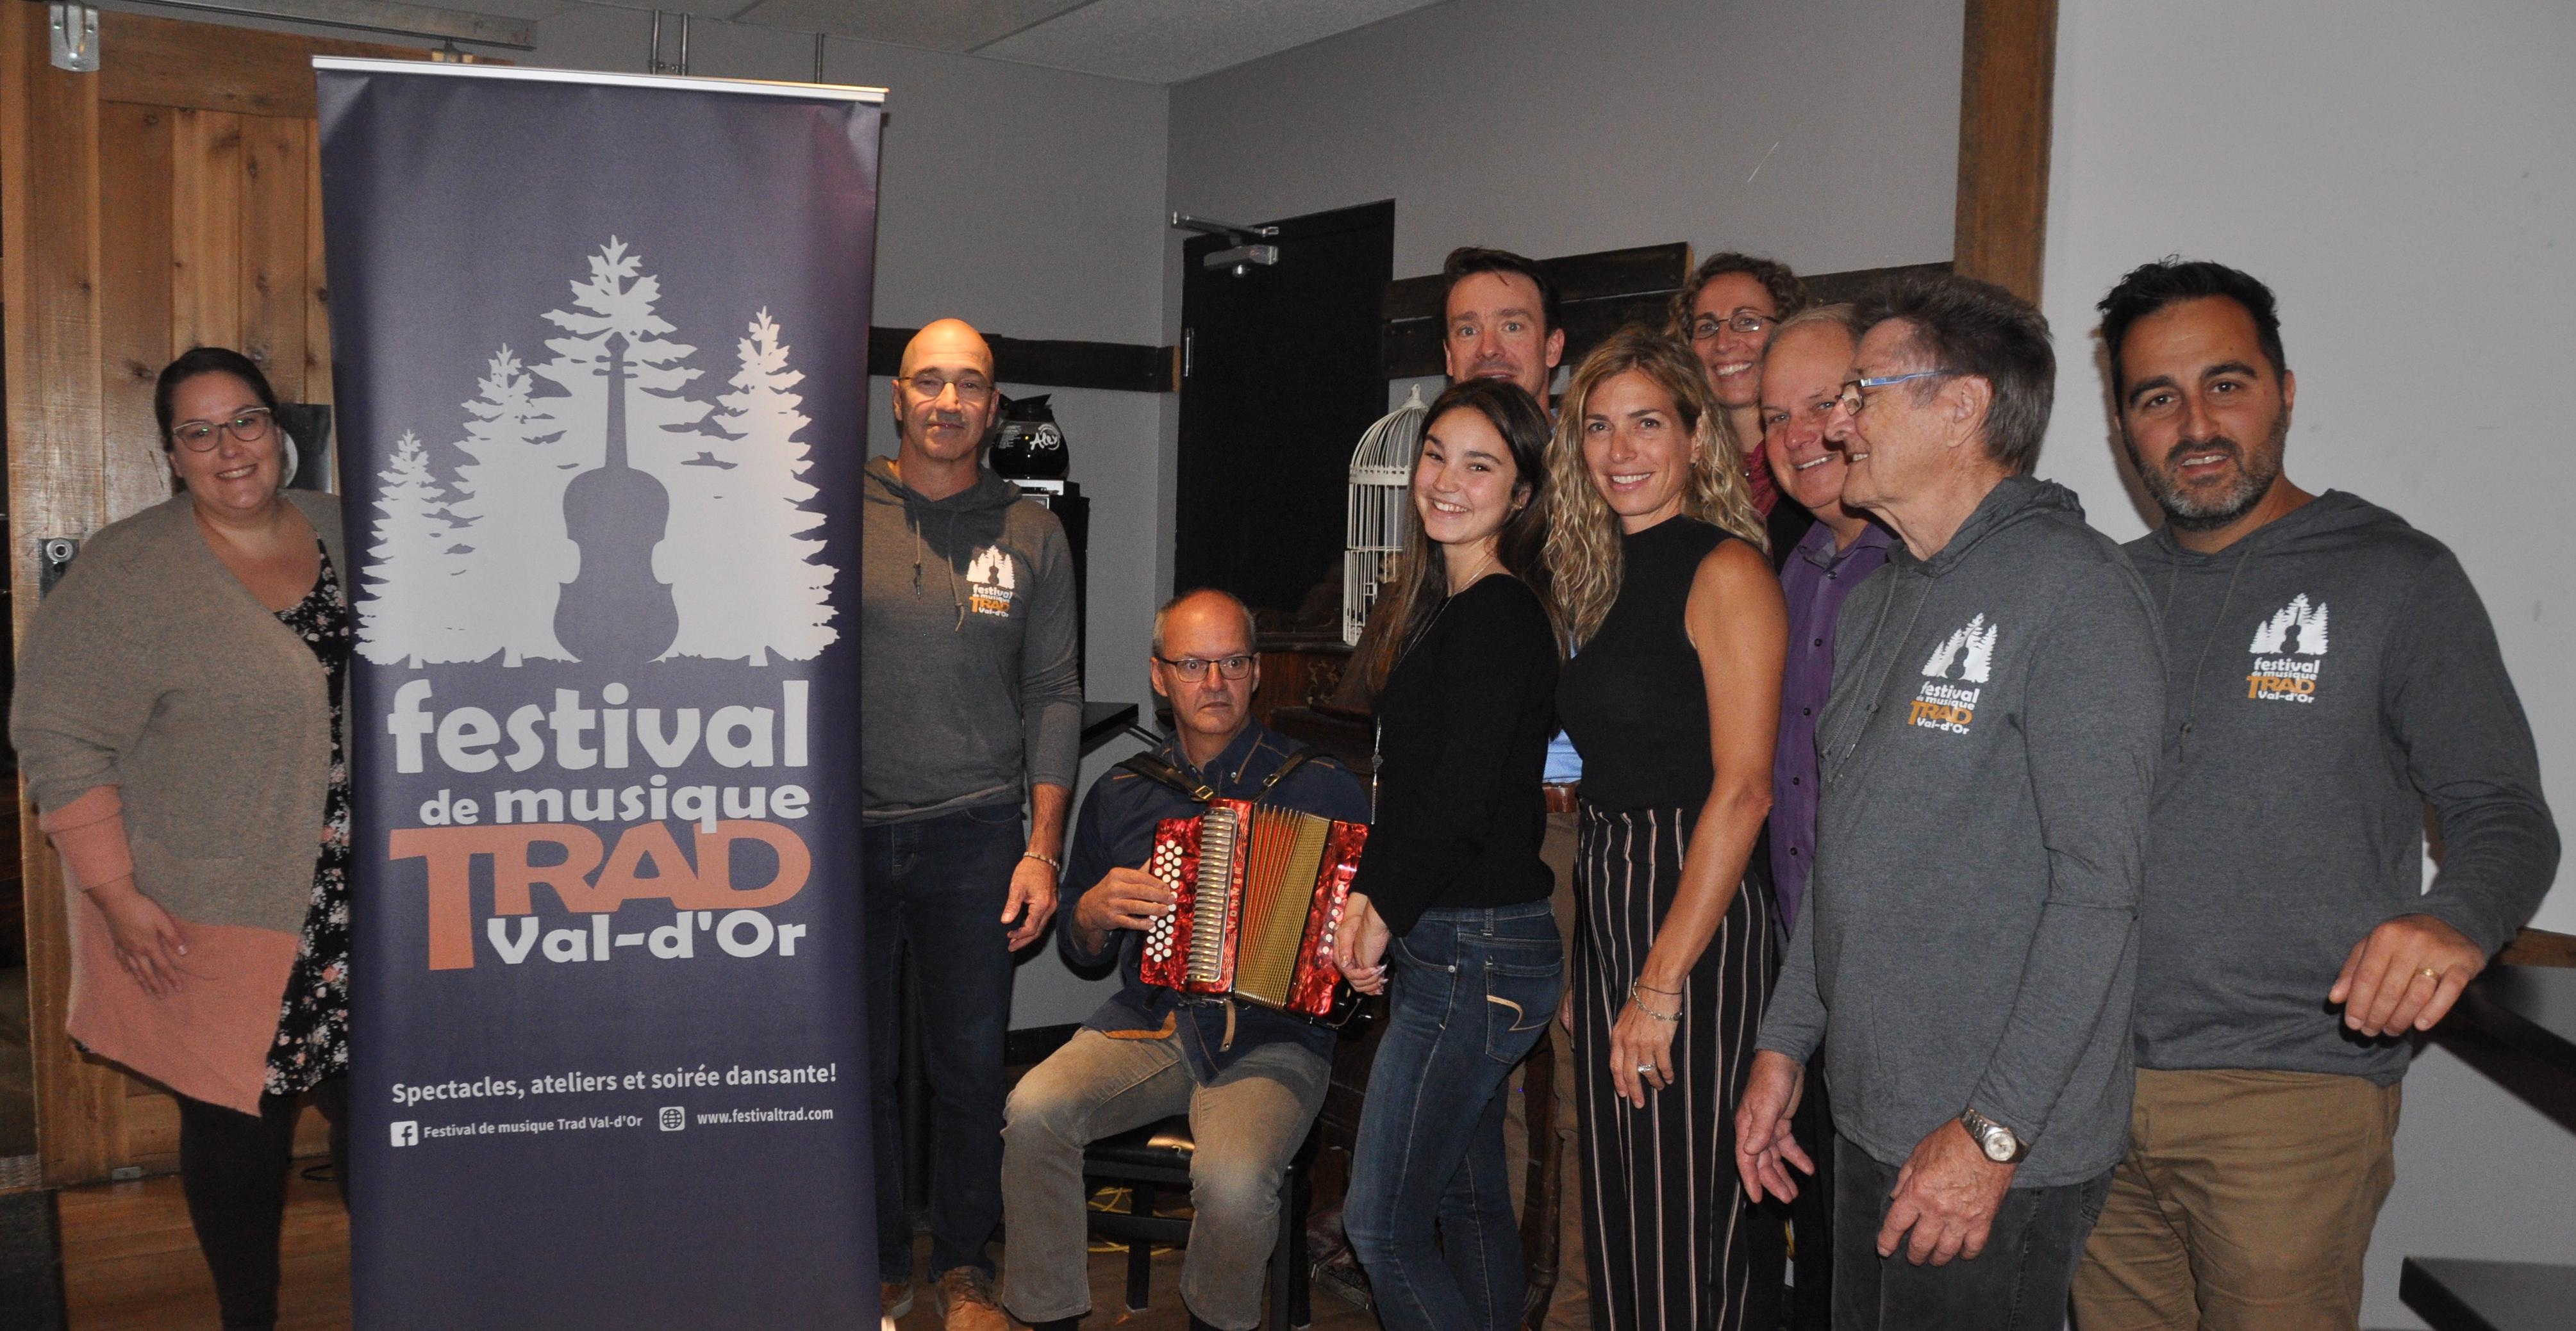 Festival de musique trad de Val-d'Or